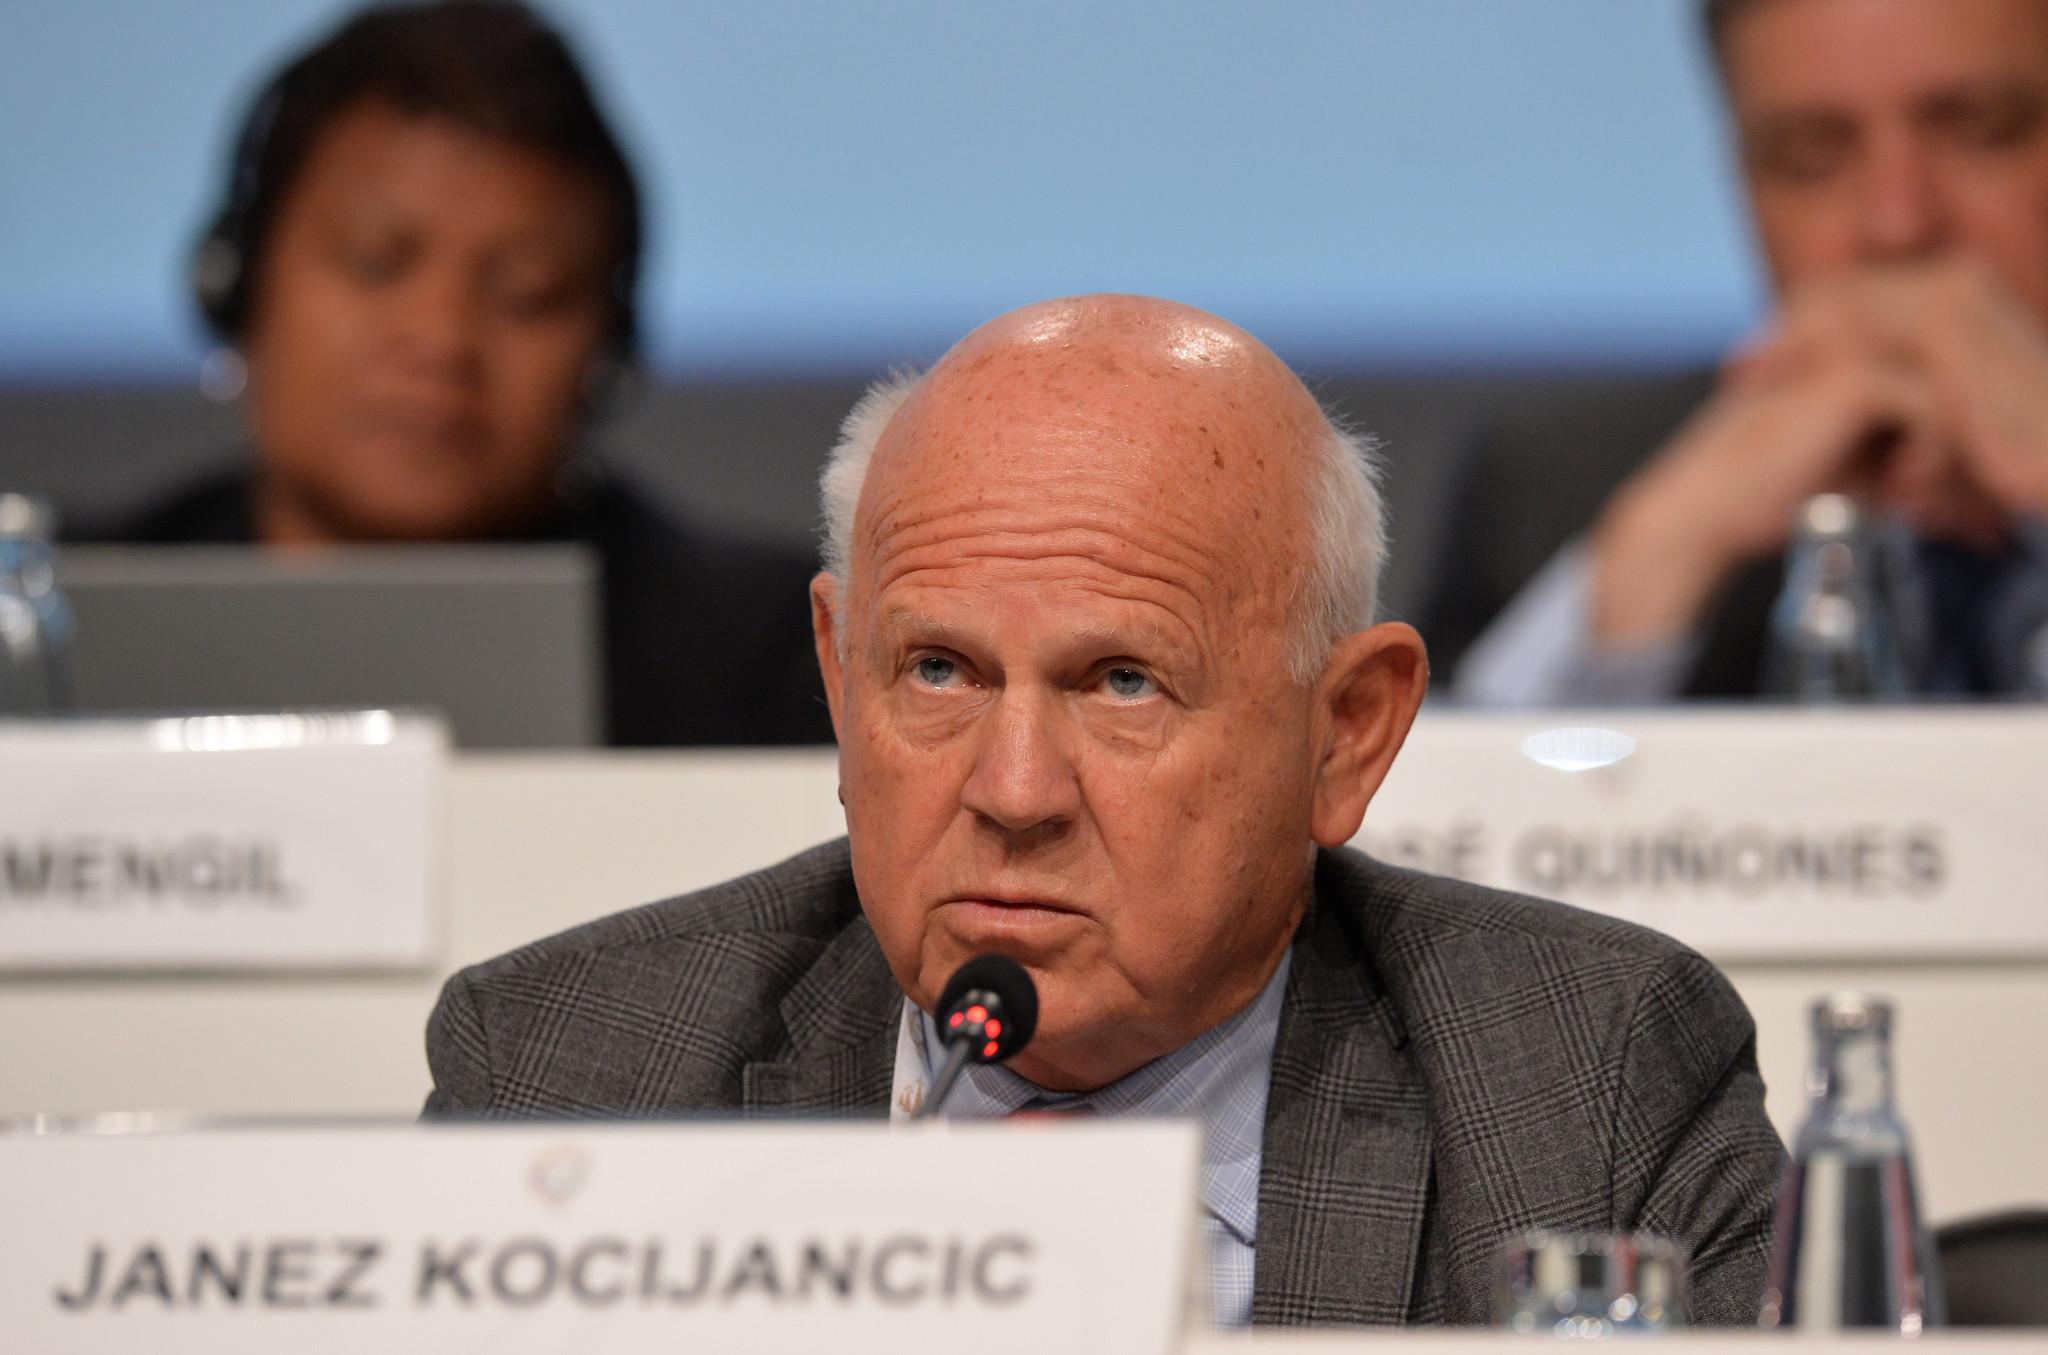 Janez Kocijančič remains an FIS vice-president ©Getty Images